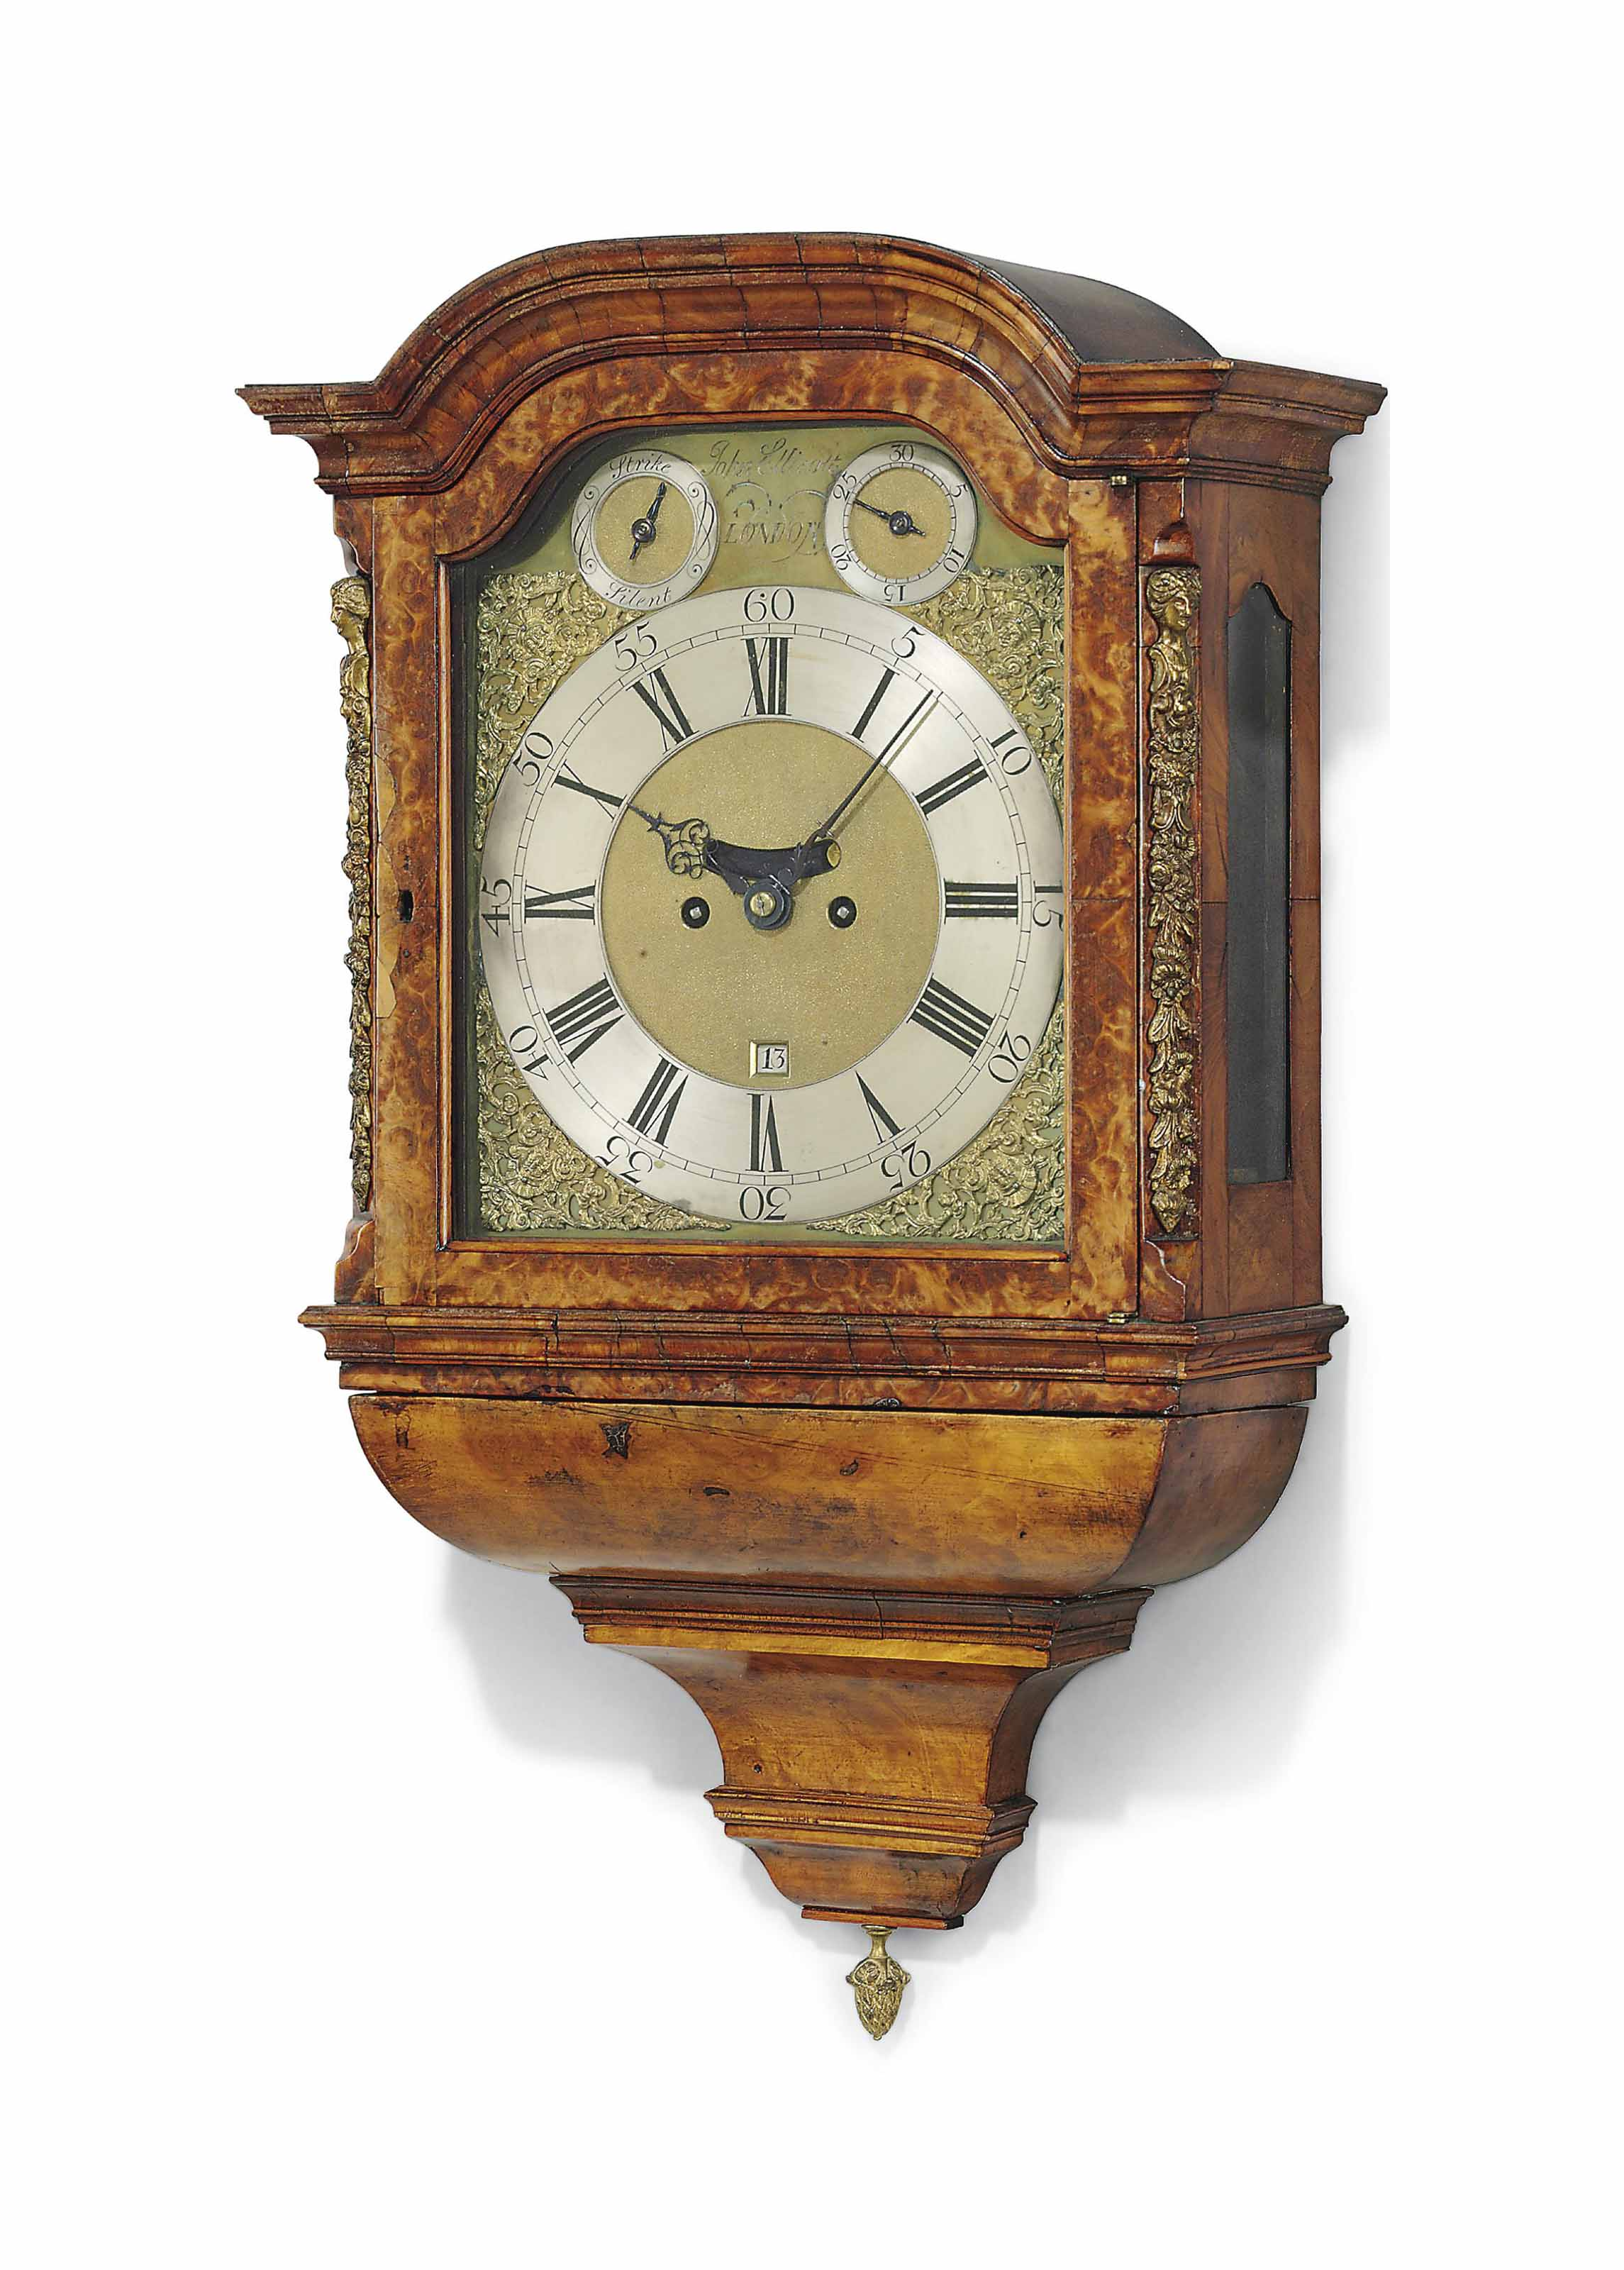 A GEORGE II WALNUT EIGHT-DAY STRIKING HOODED WALL CLOCK